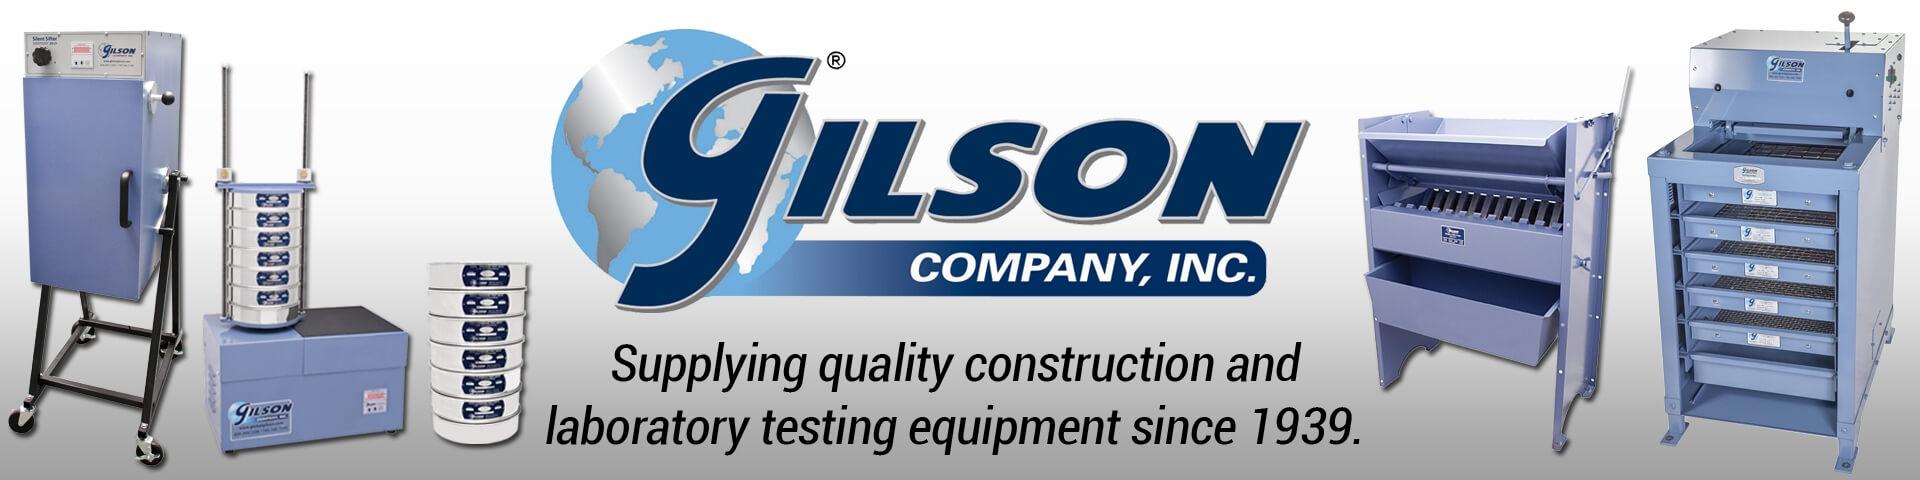 Gilson Company, Inc. - Supplying quality construction and laboratory testing equipment since 1939